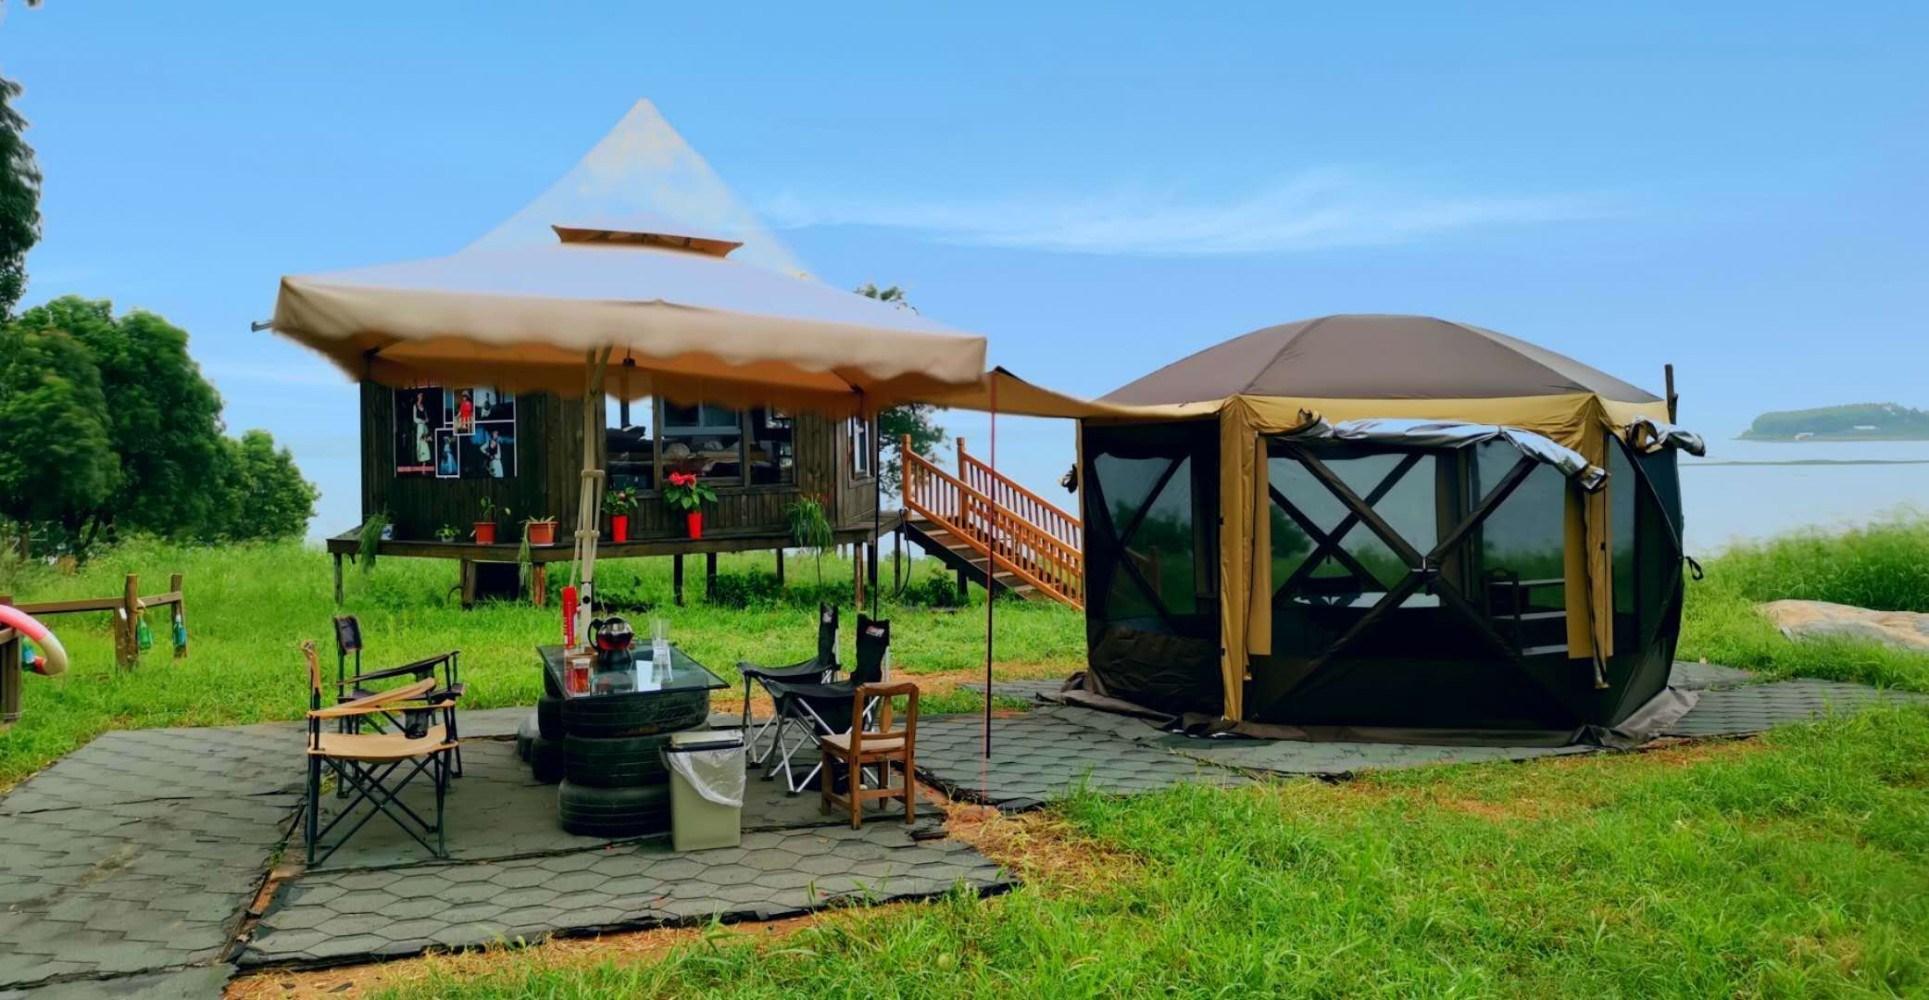 Sudong 레져 레저 캠핑 텐트 대형 6인용 이상 야외 접이식 휴대용, 업그레이드 버전 3.6 * 3.6 이중 도어